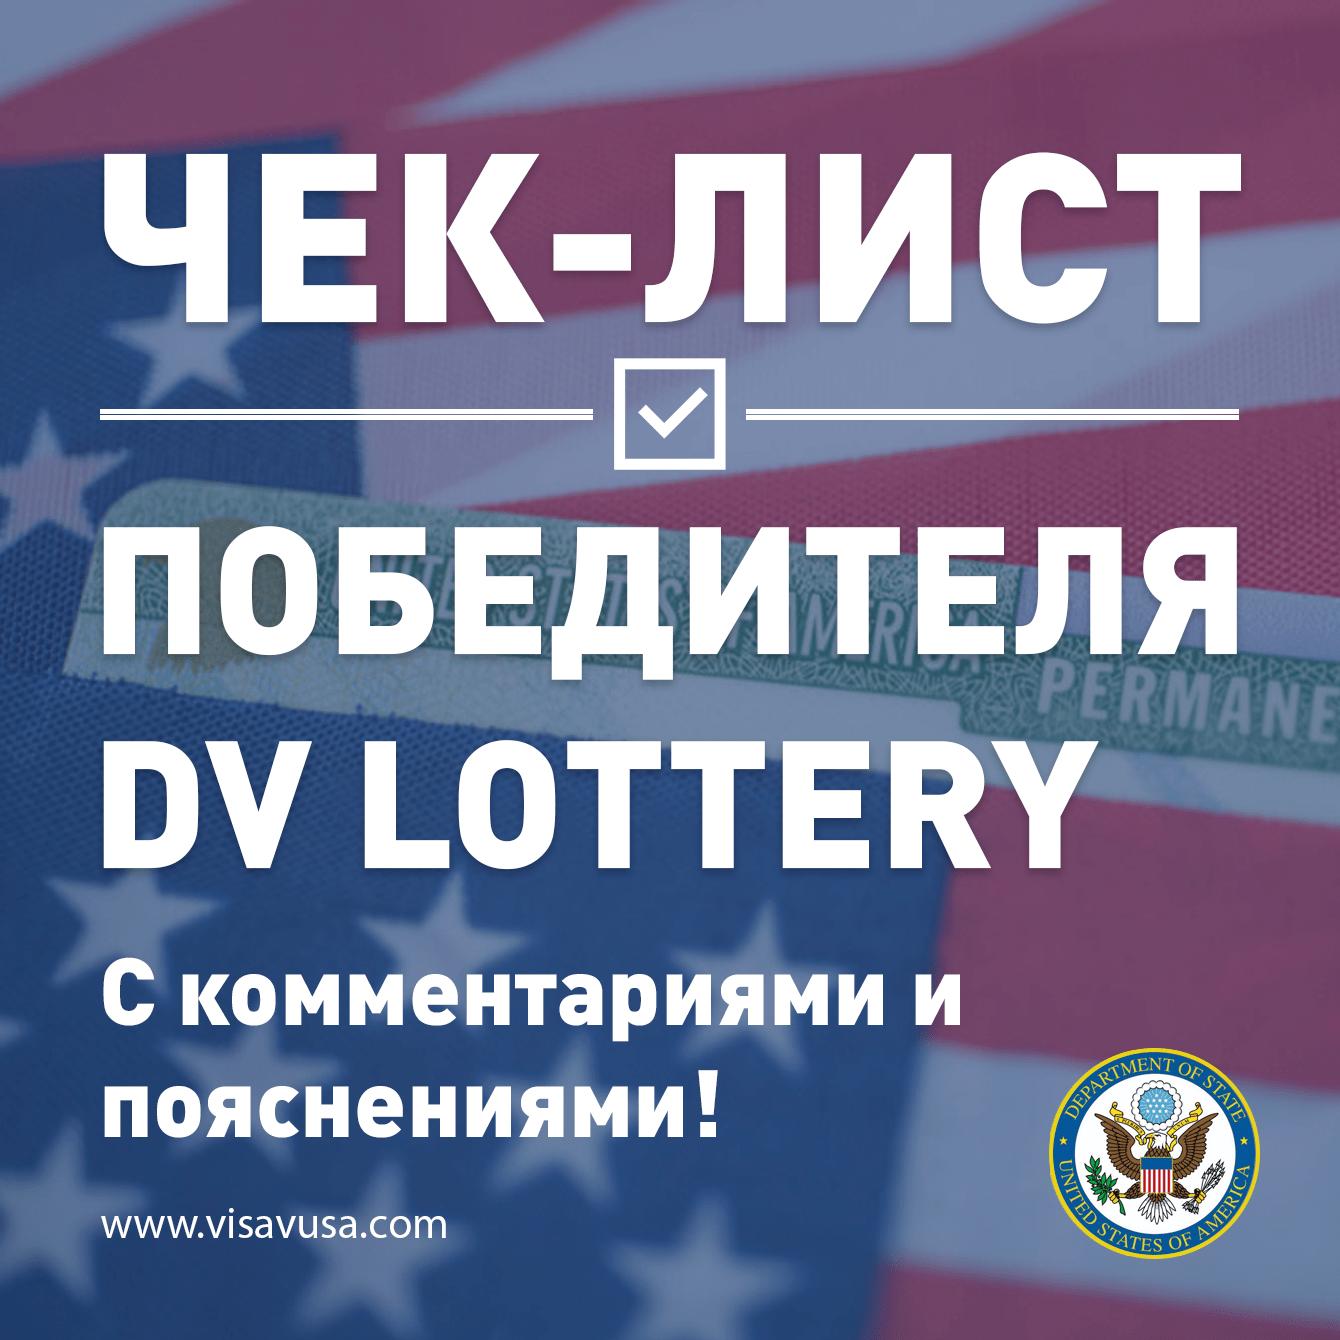 Чек-лист победителя DV Lottery